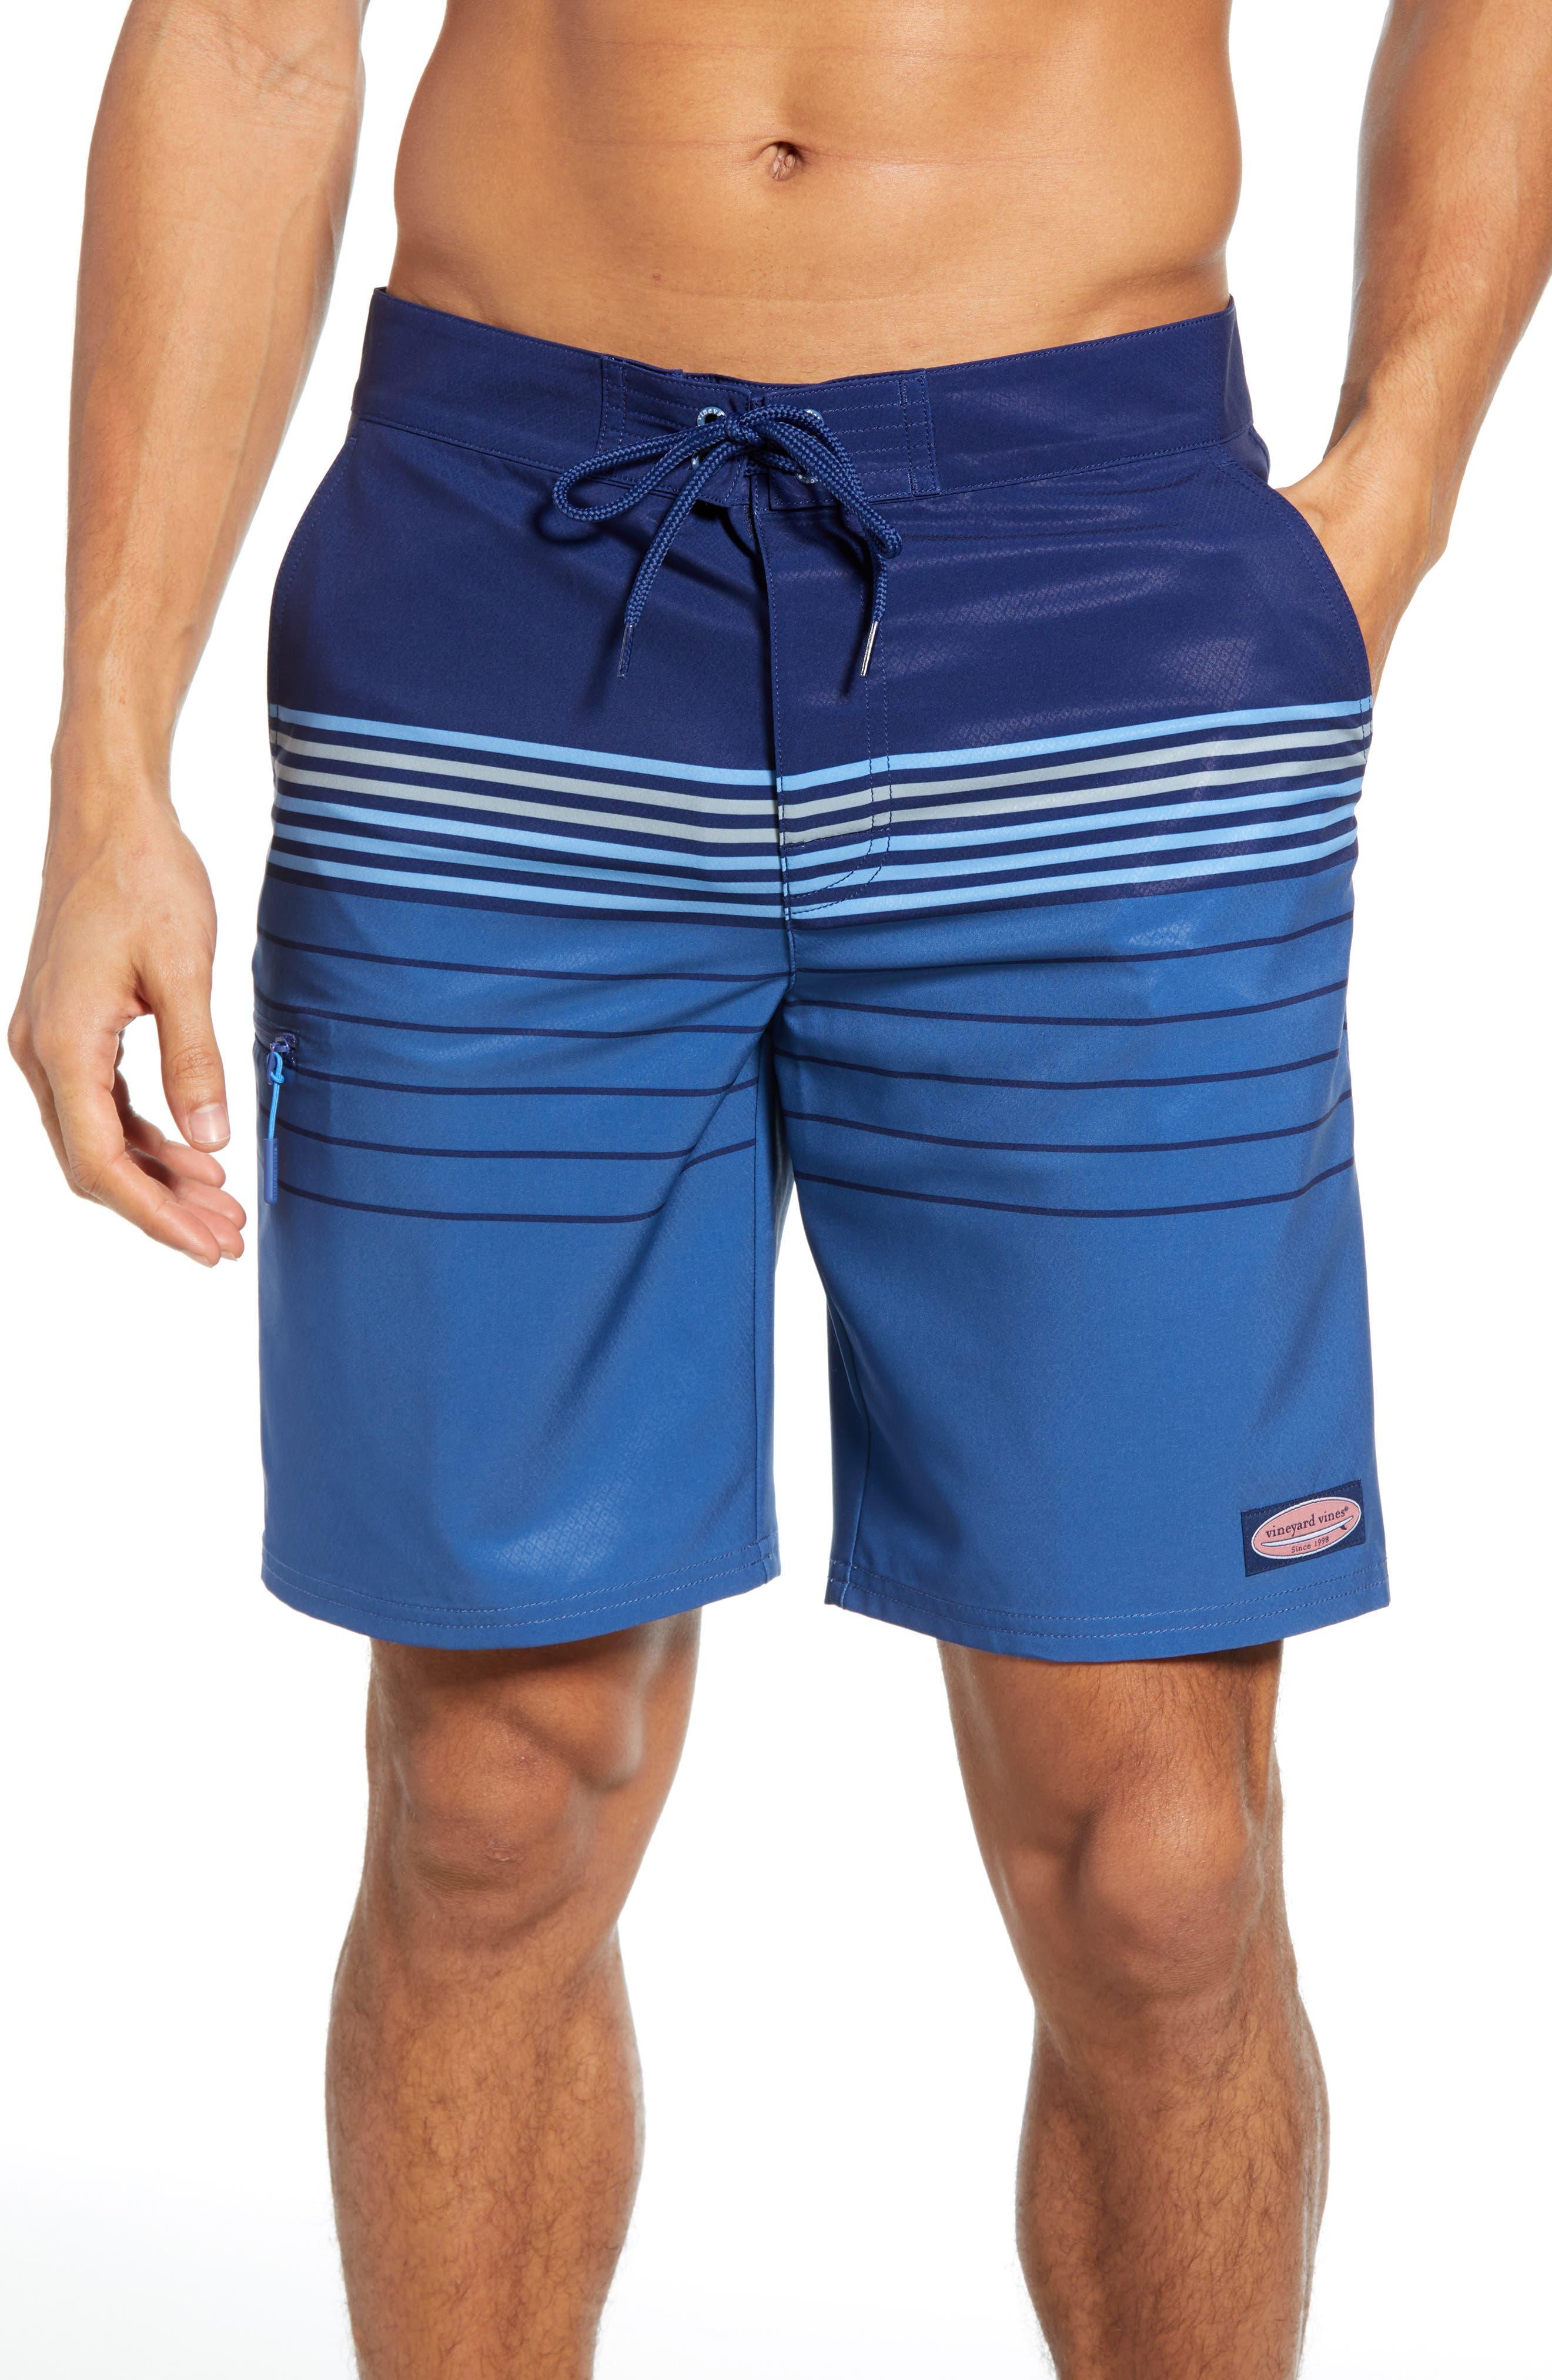 Vineyard Vines Stripe Stretch Board Shorts, Blue